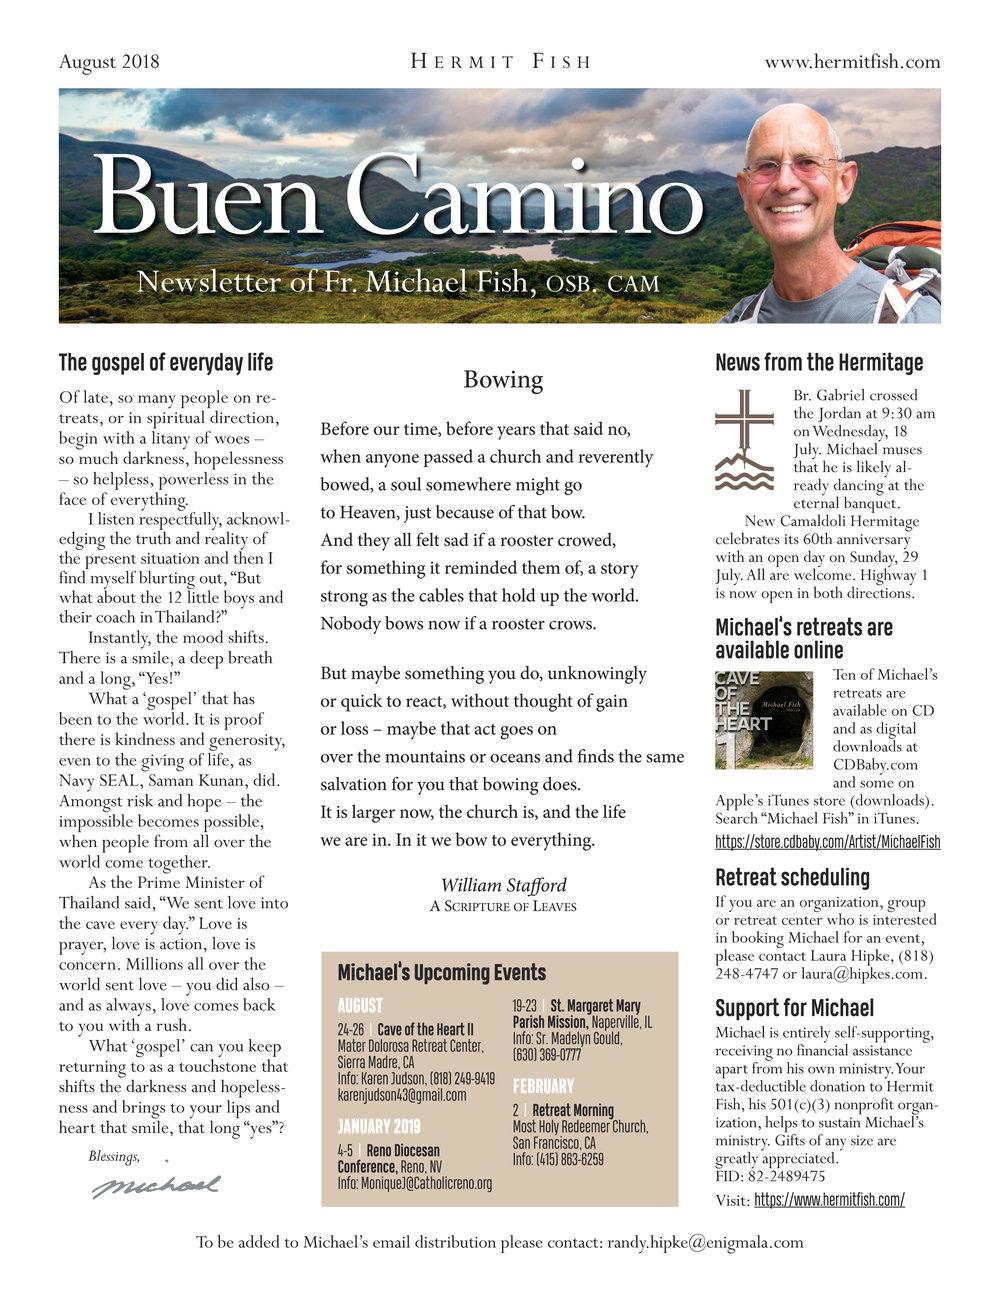 Buen Camino Aug 2018.jpg